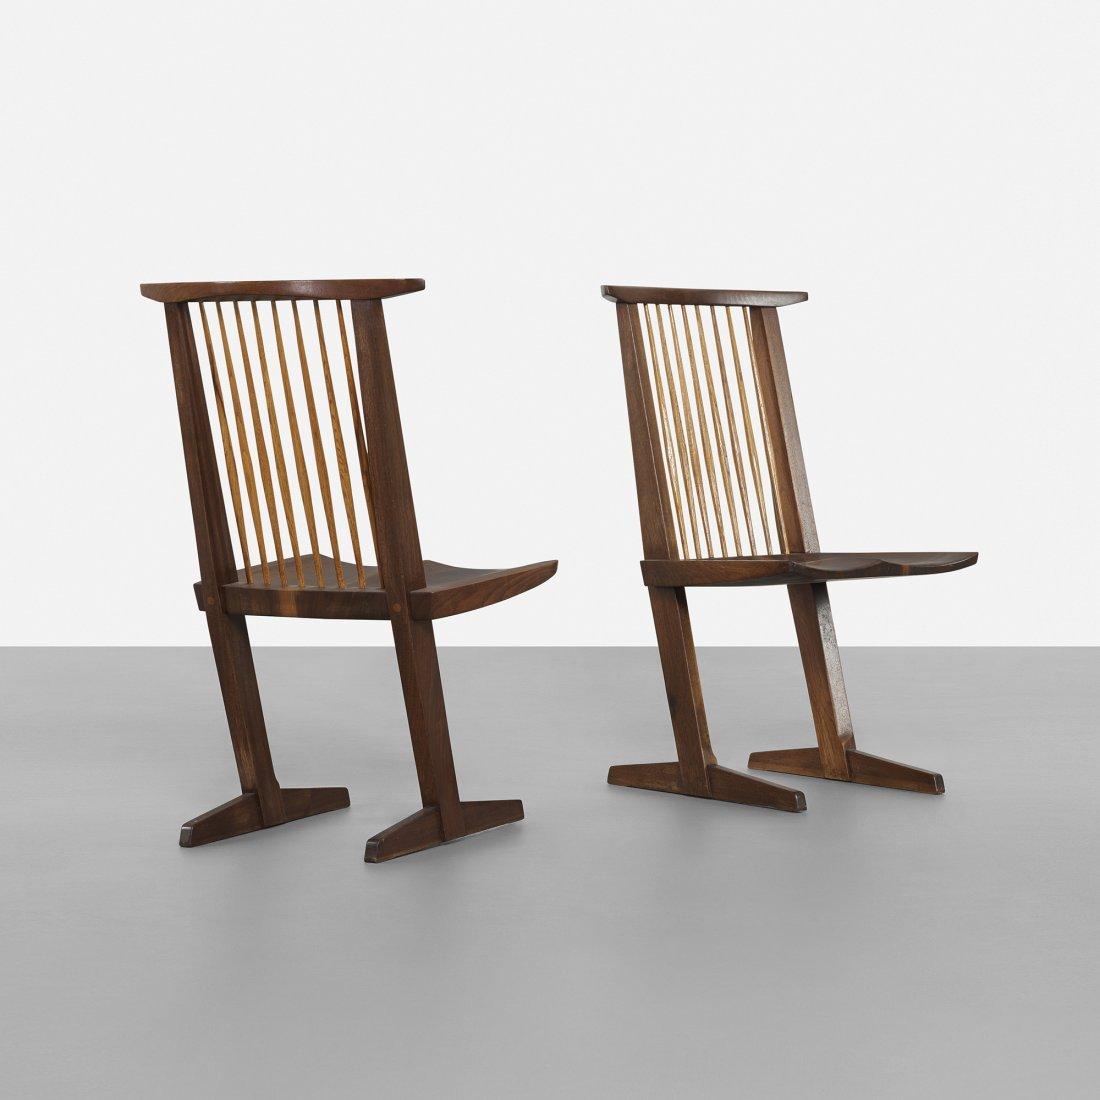 George Nakashima Conoid dining chairs, pair